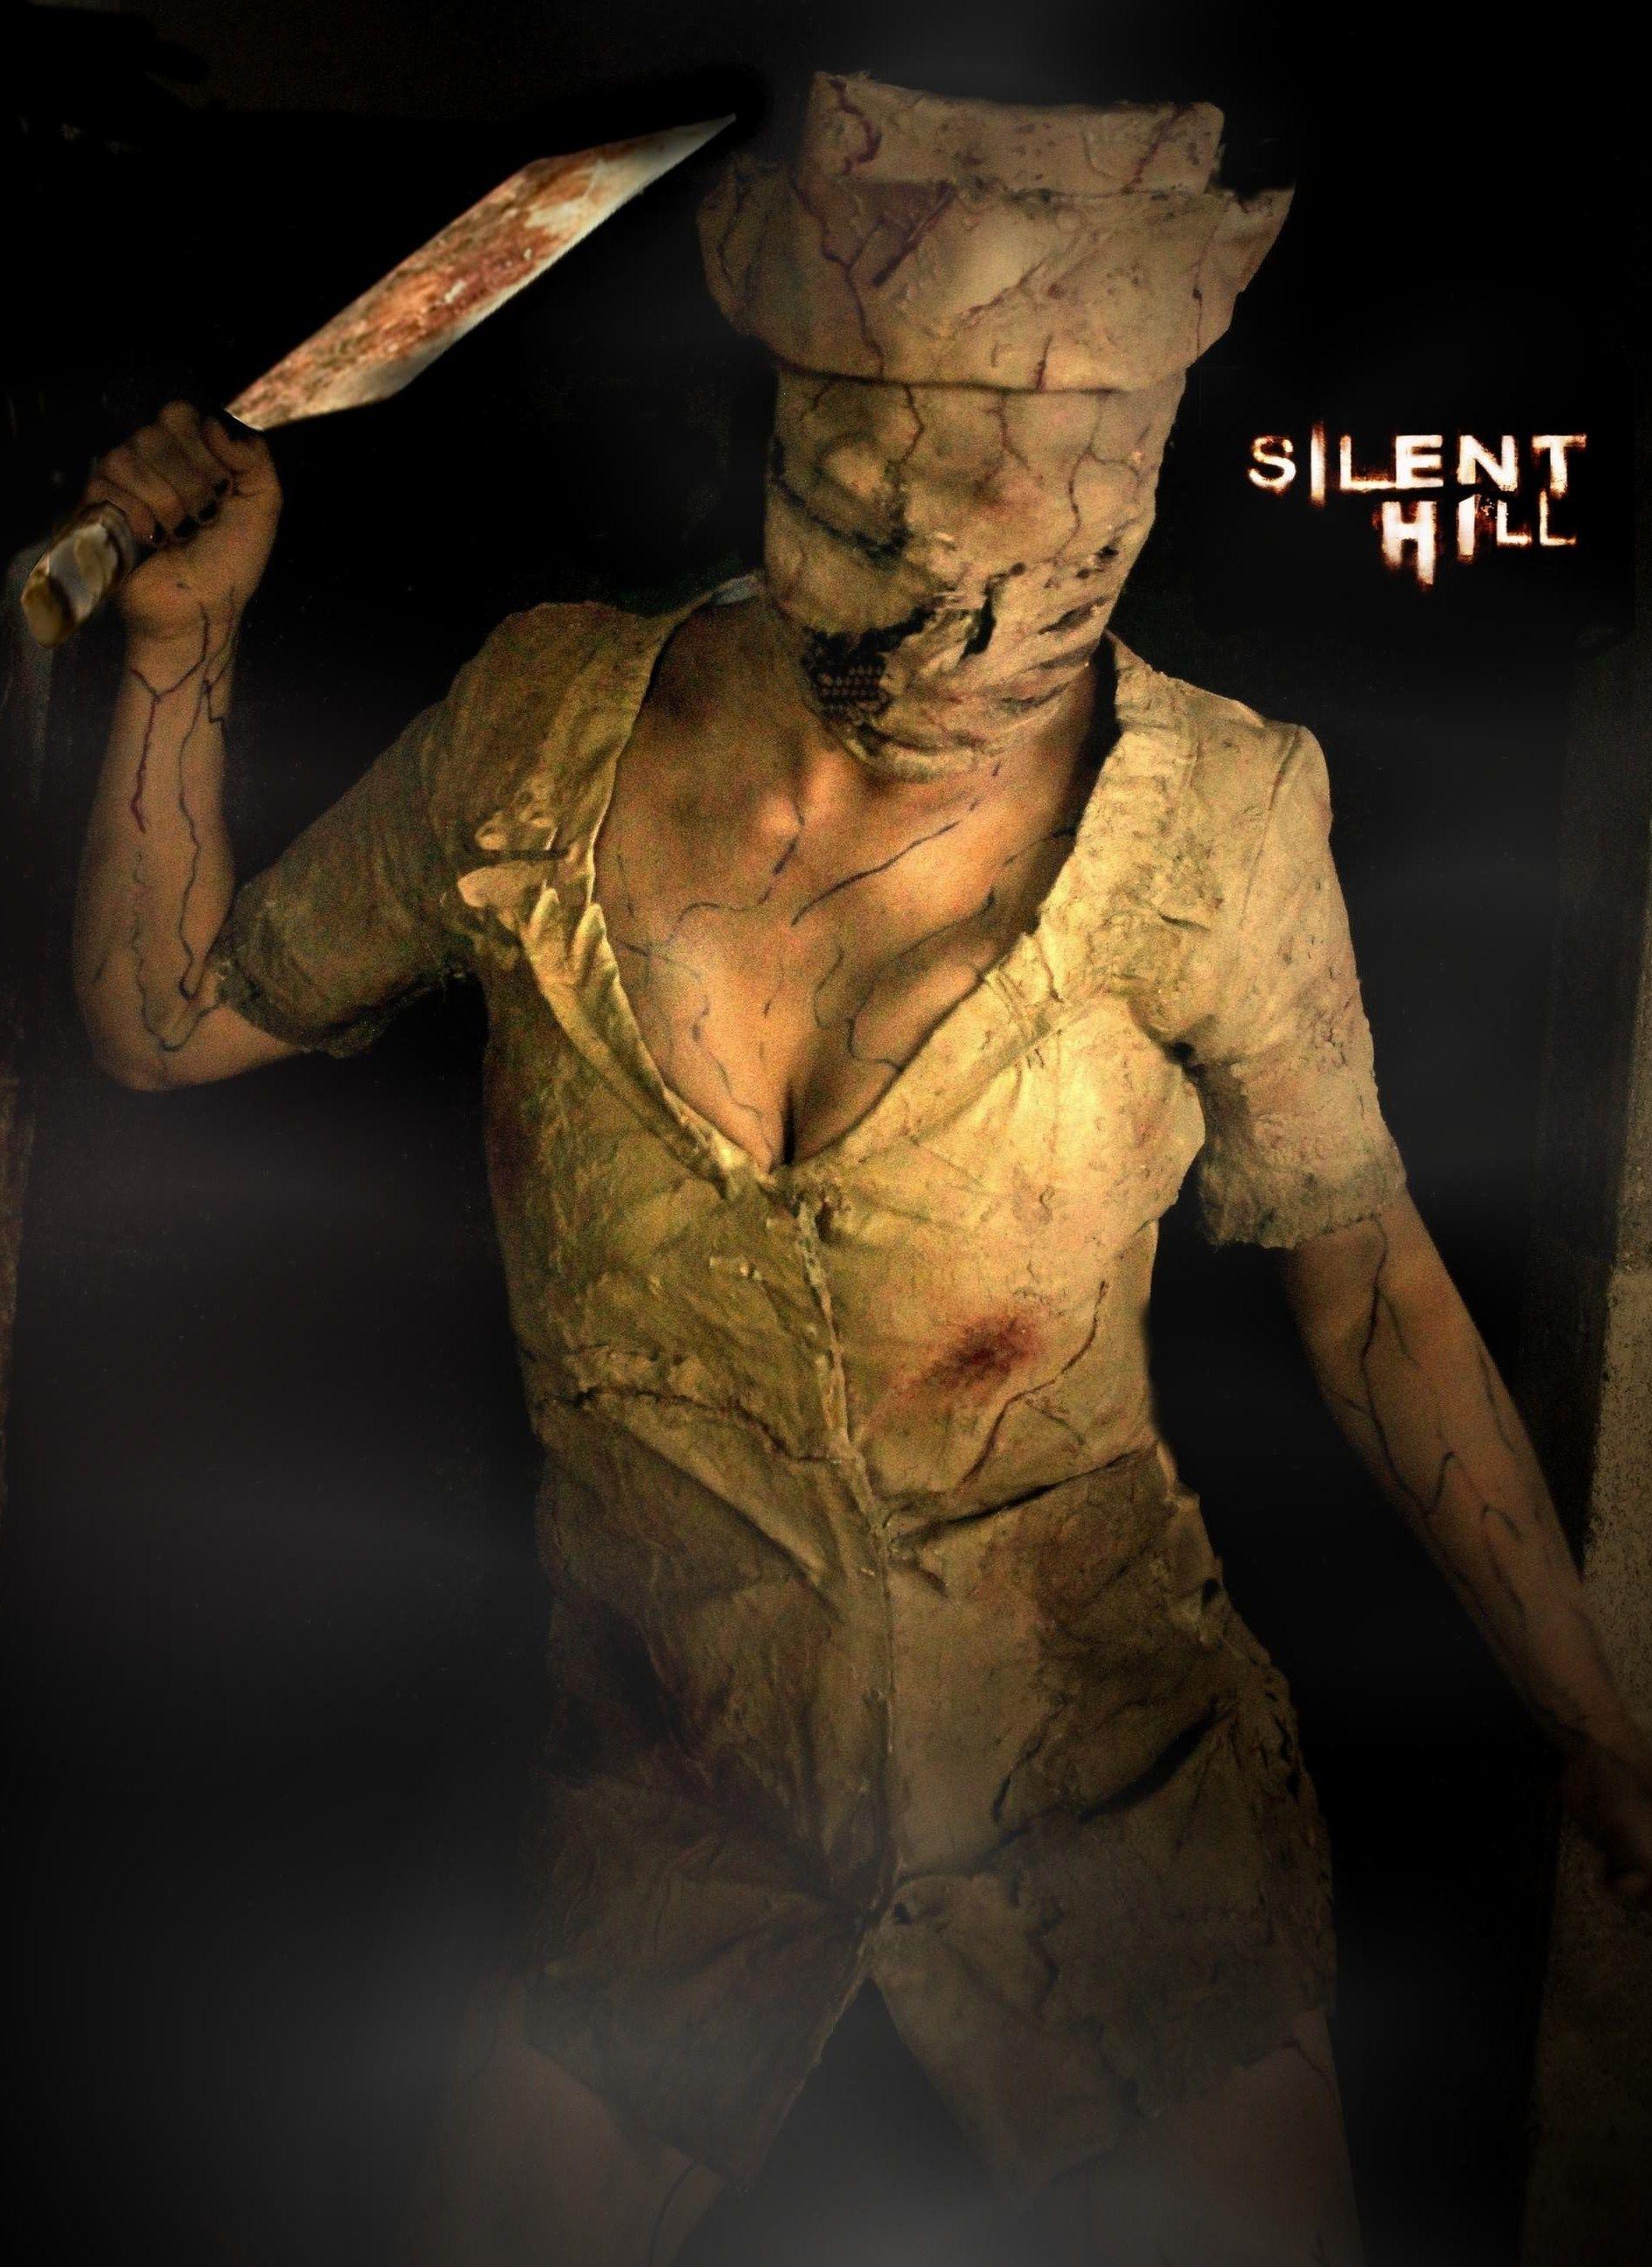 silent hill nurse silent hill 34841550 1896 1896 2602 movies tv pinterest. Black Bedroom Furniture Sets. Home Design Ideas